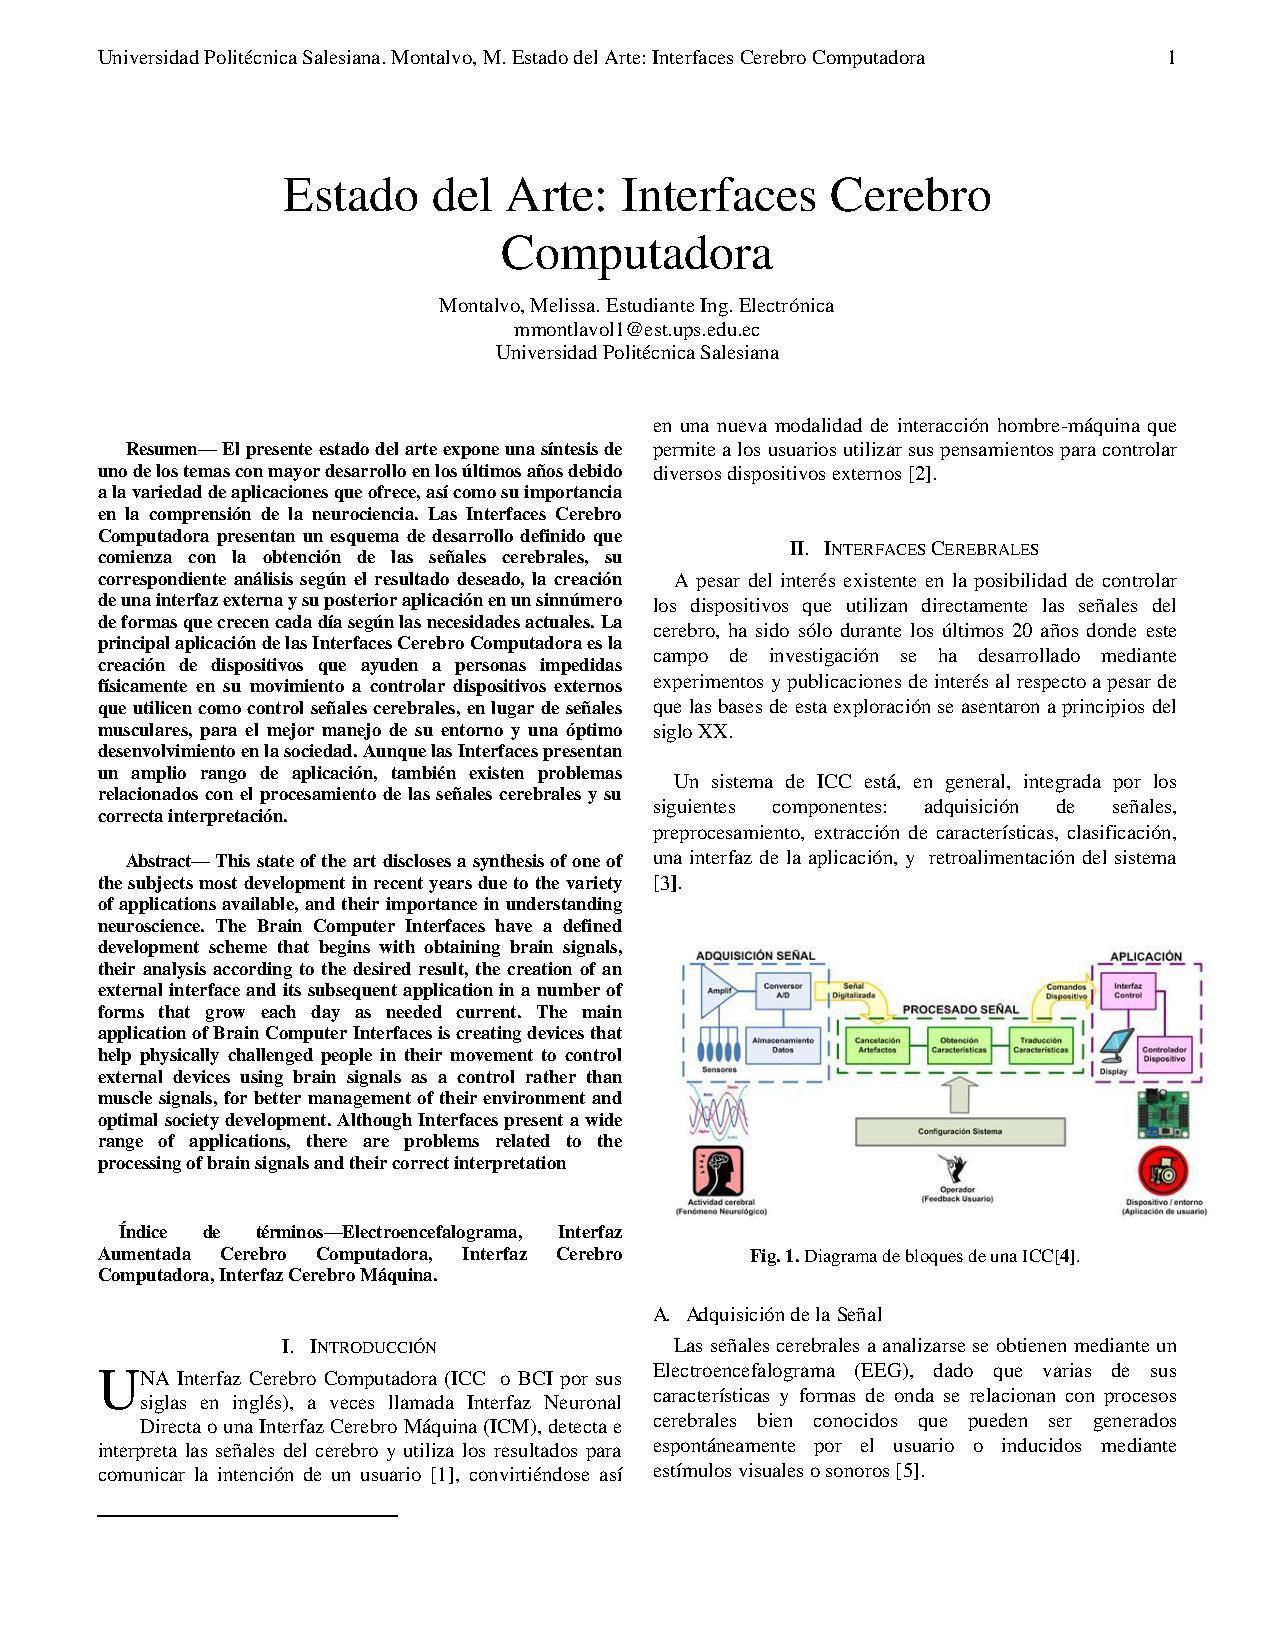 File:Interfaz Cerebro Computadora.pdf - Wikimedia Commons